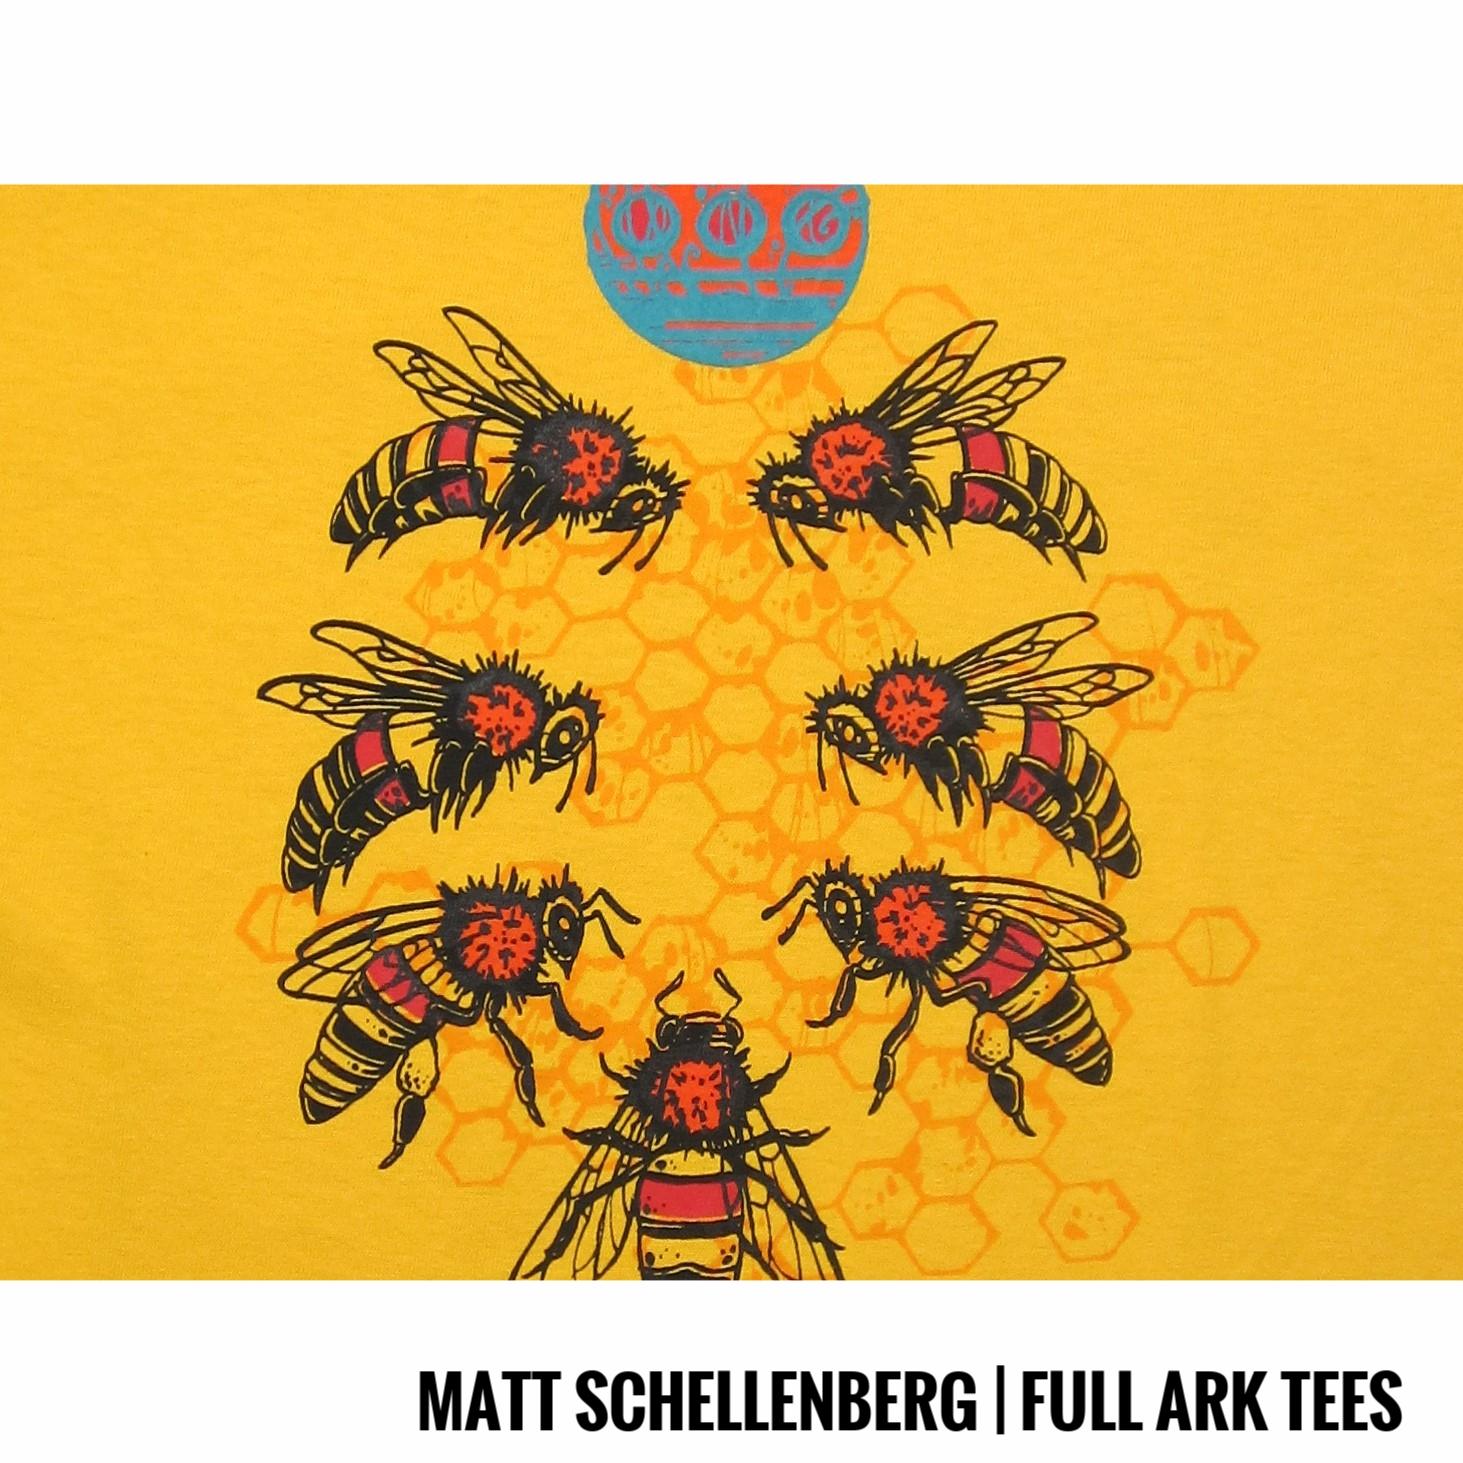 Matt Schellenberg | Full Ark Tees